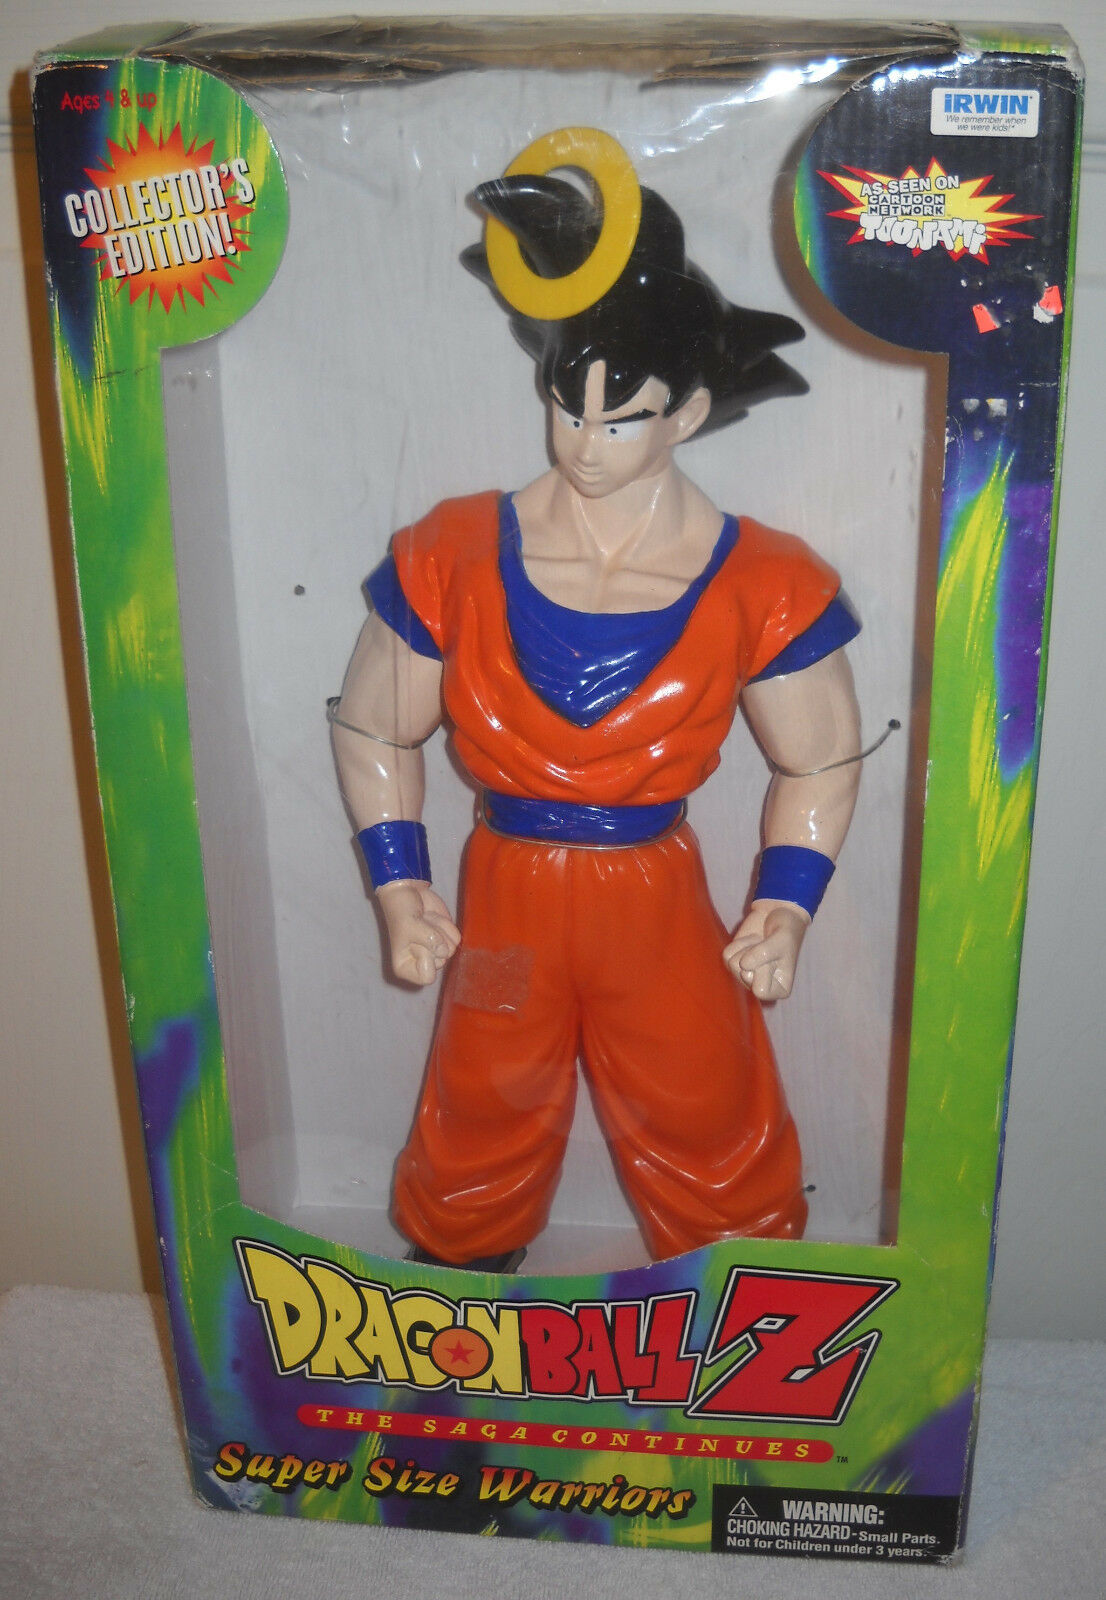 7126 NRFB Irwin Collectors Edition Dragonball Z Goku Super Größe Warrior Figure